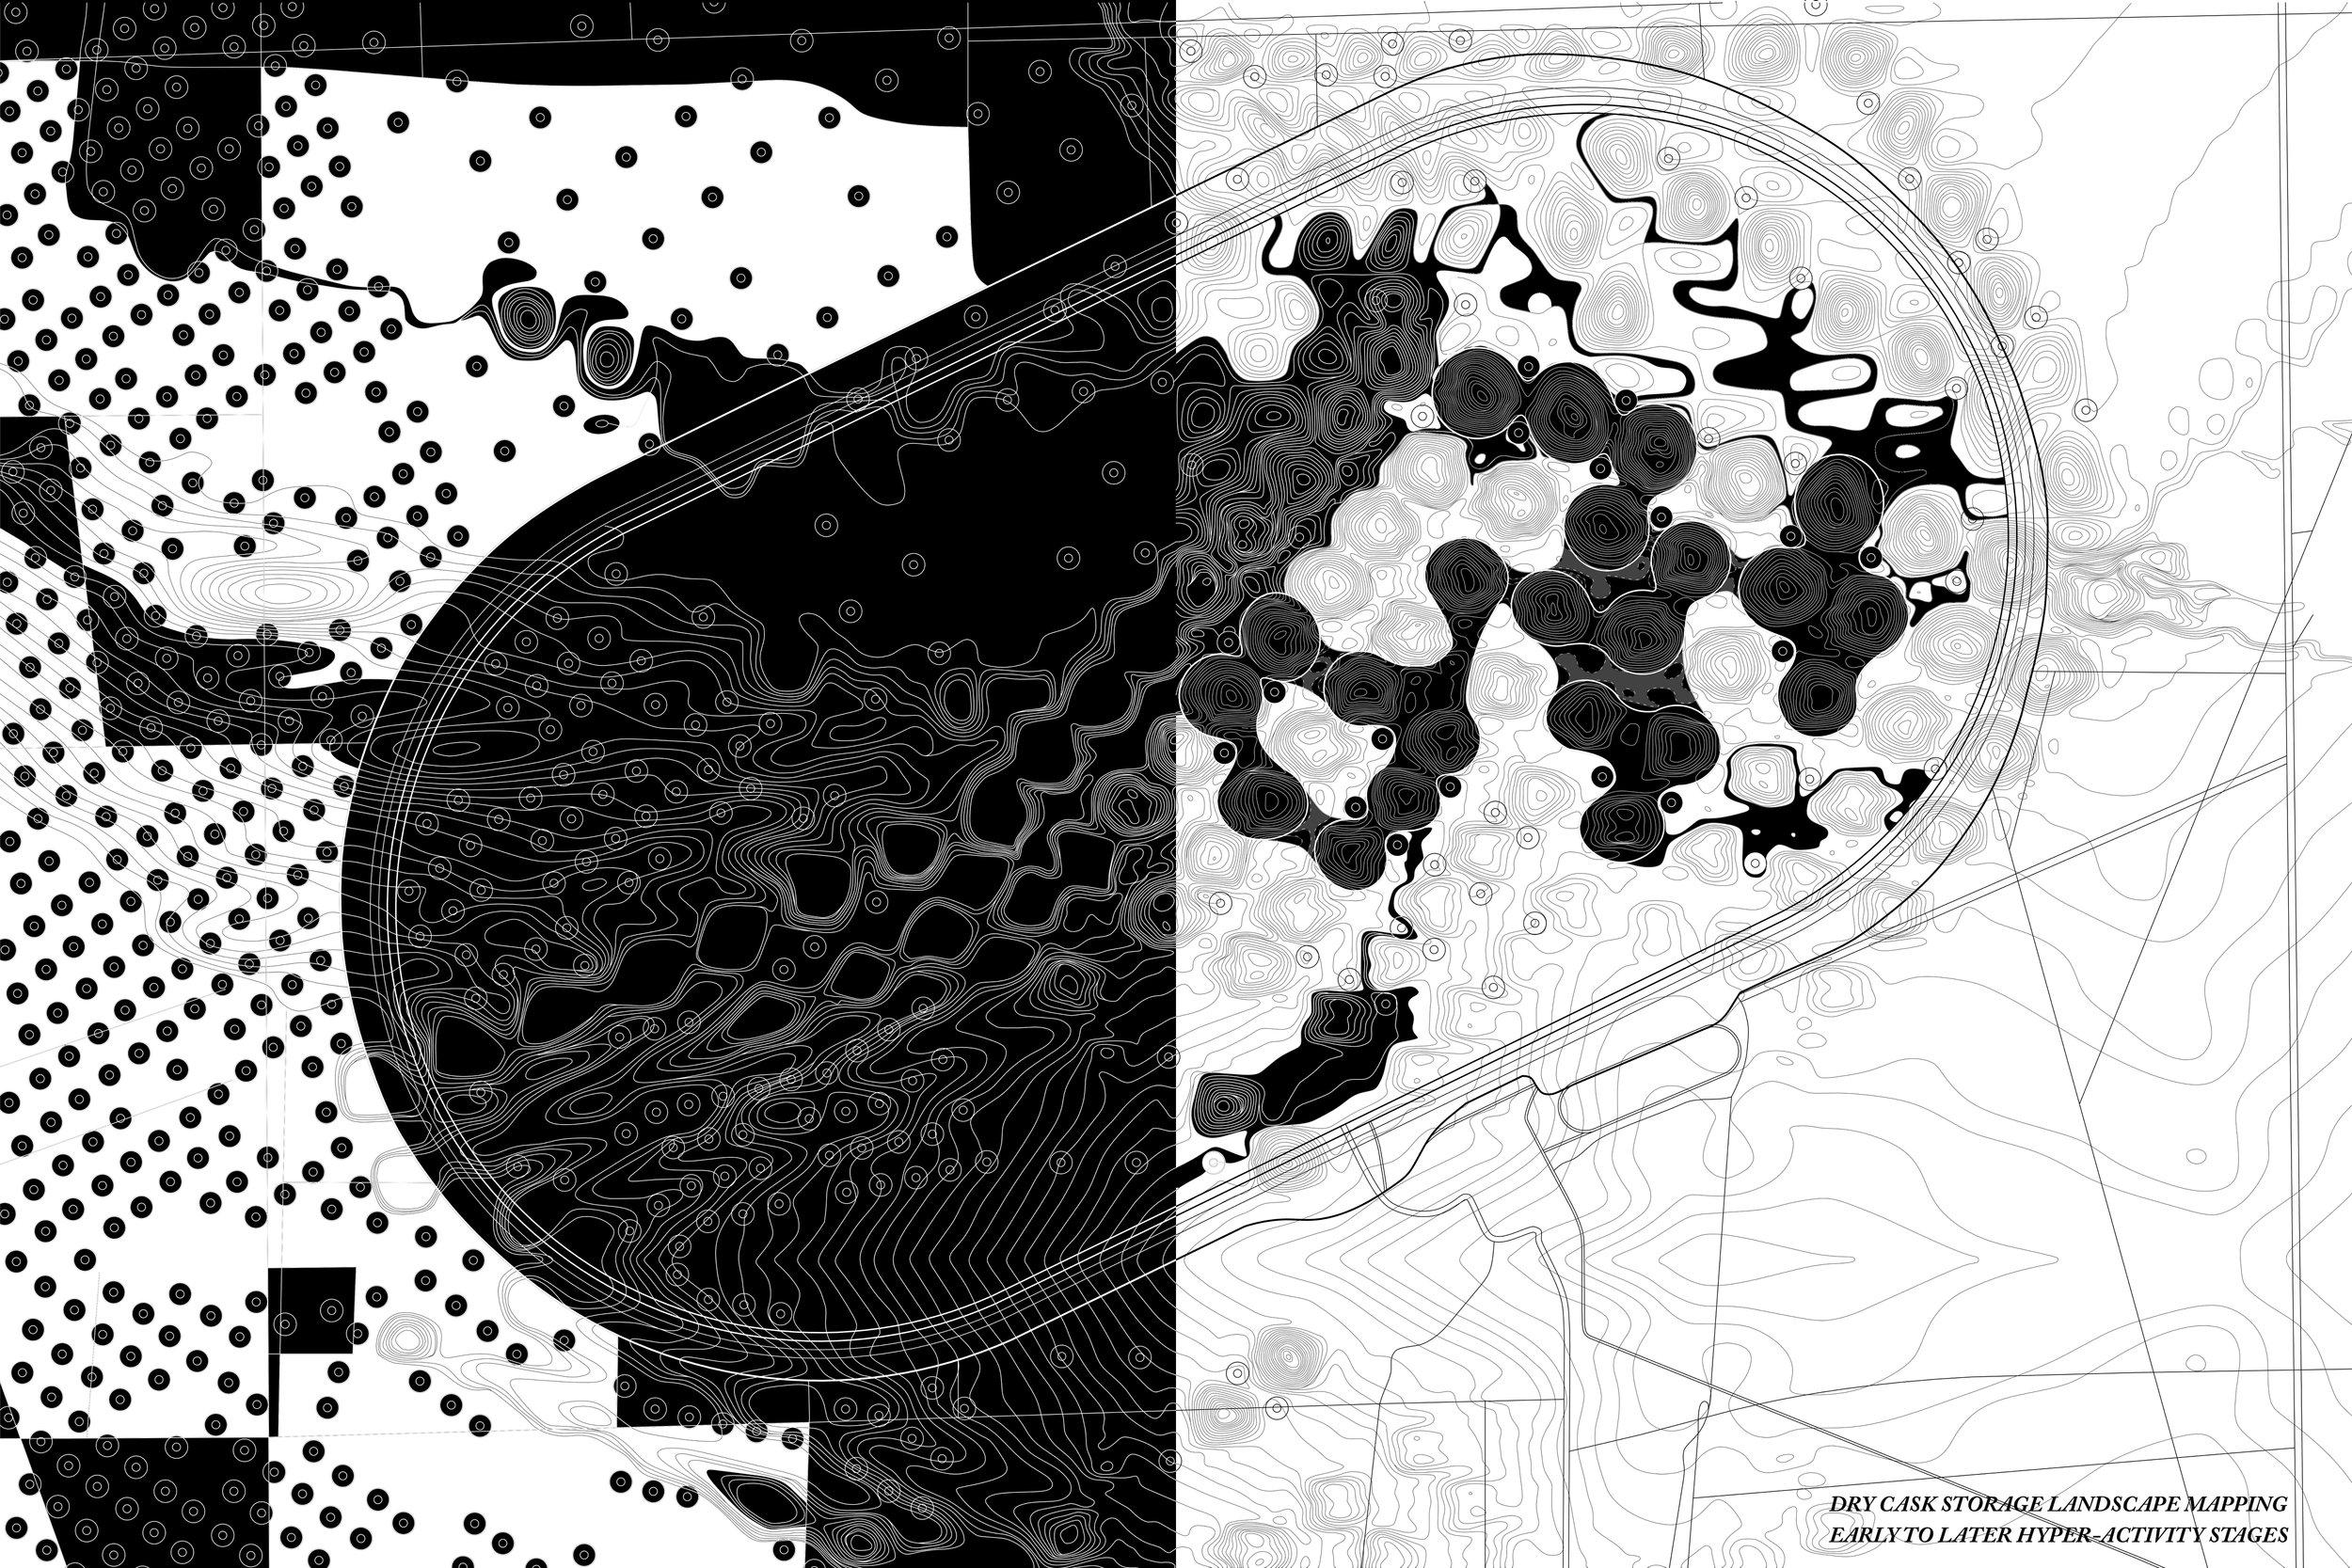 Copy of gpierre_MARCH-607-04_B04b_Site Plan Mapping.jpg